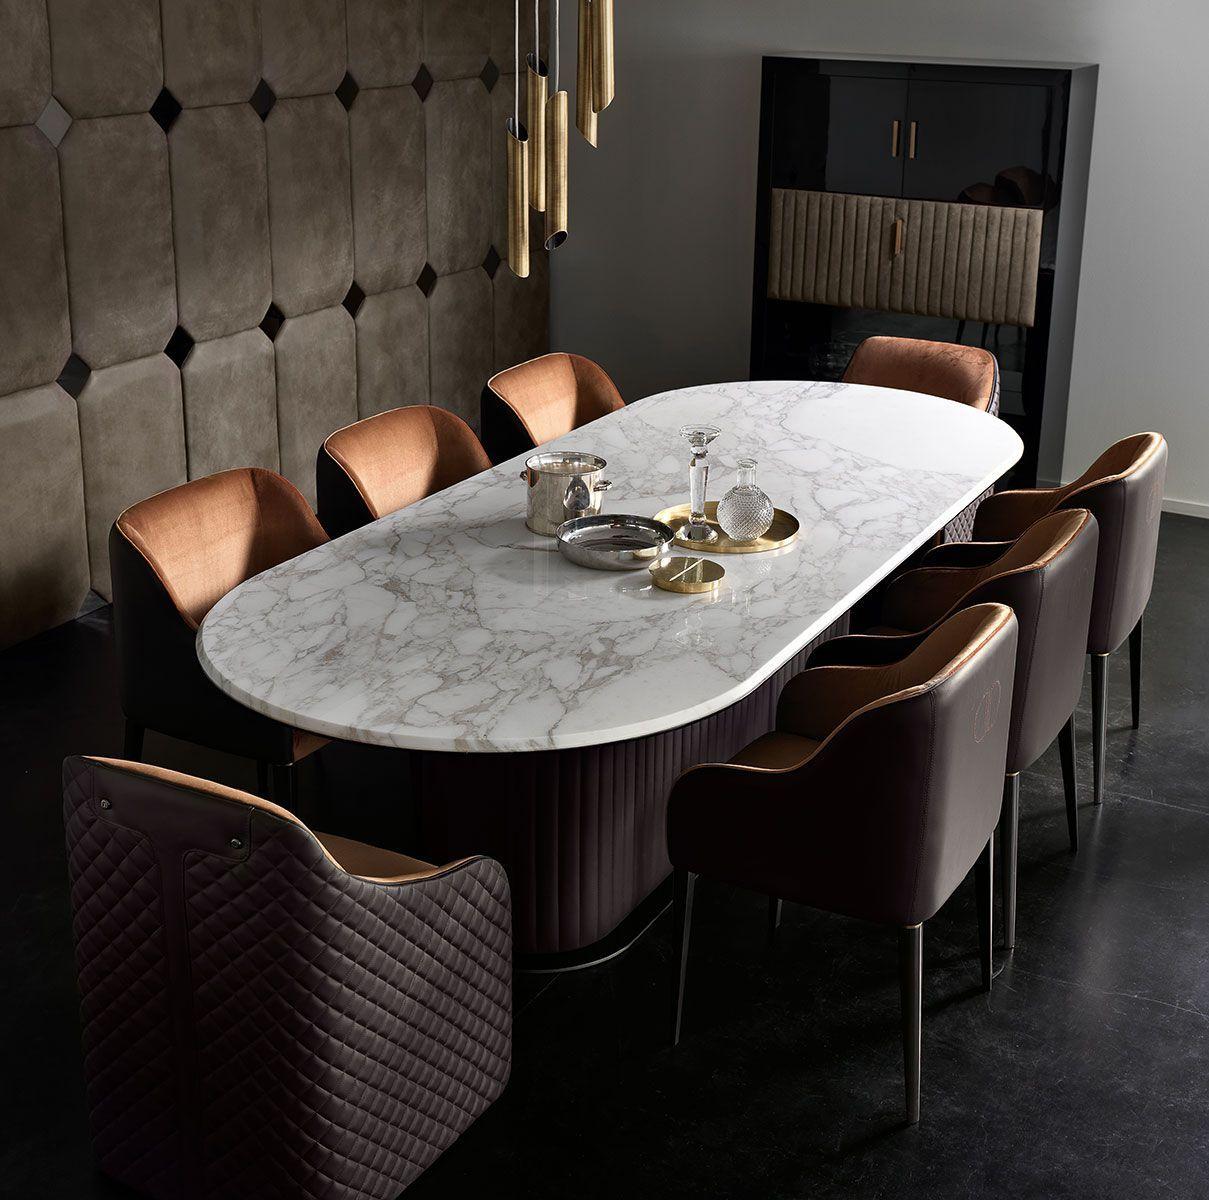 Enhance Your Senses With Luxury Home Decor Luxury Dining Room